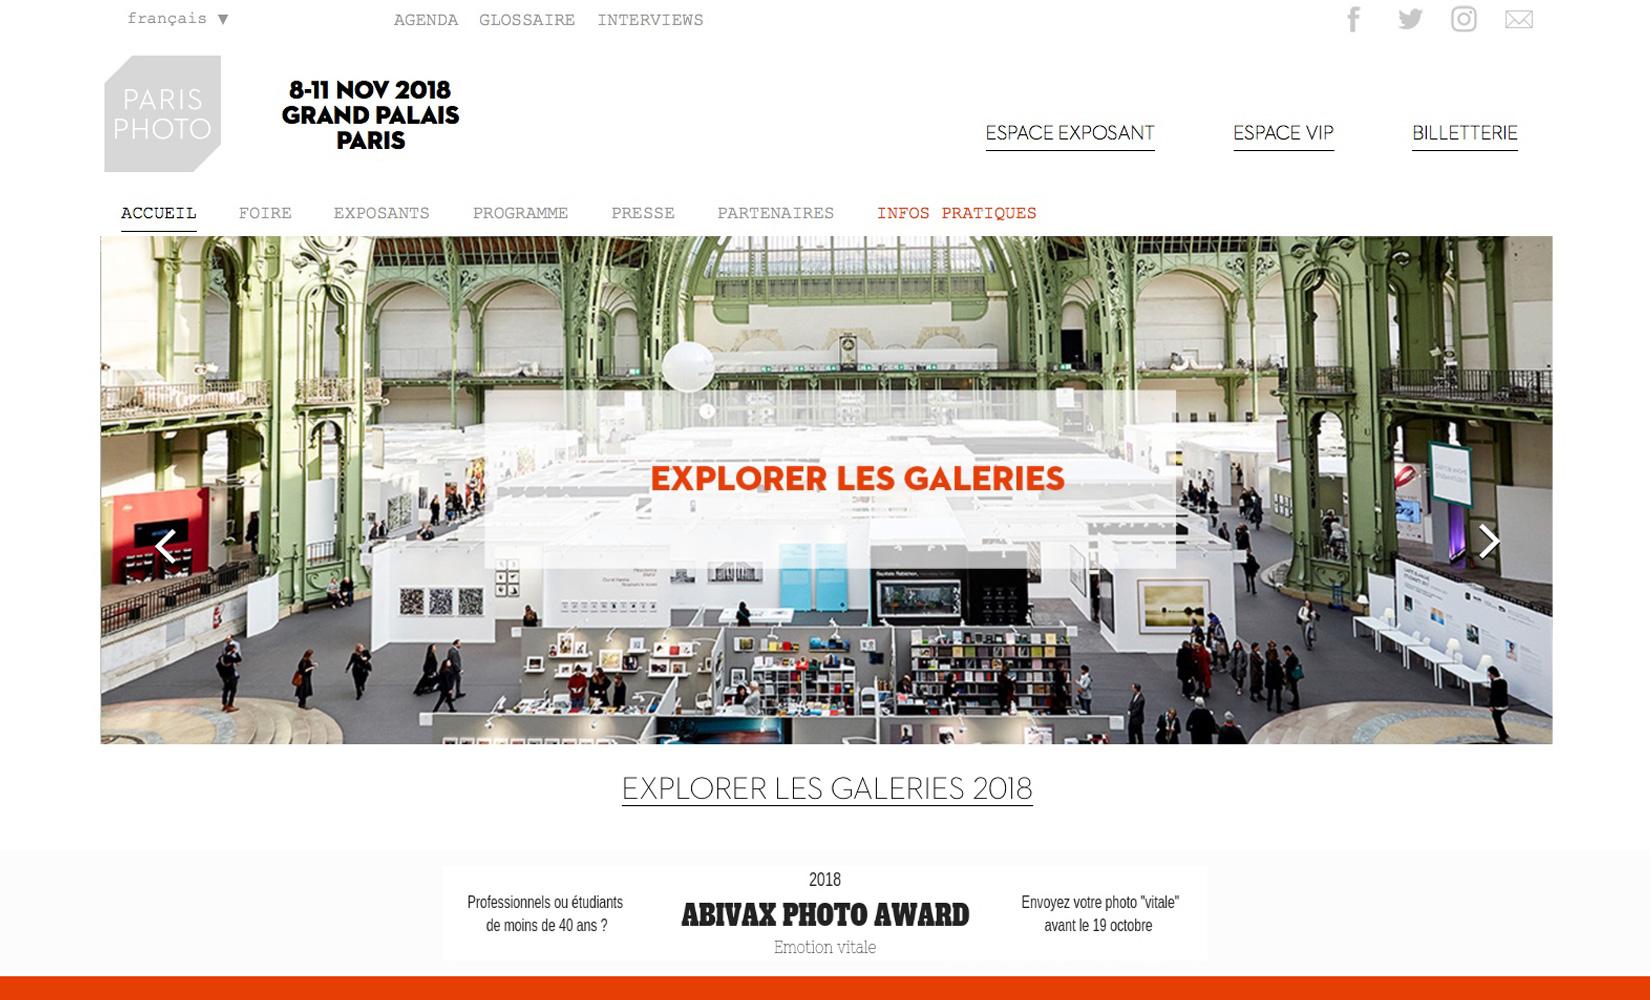 toluca-editions-alexis-fabry-paris-photo-2018.jpg